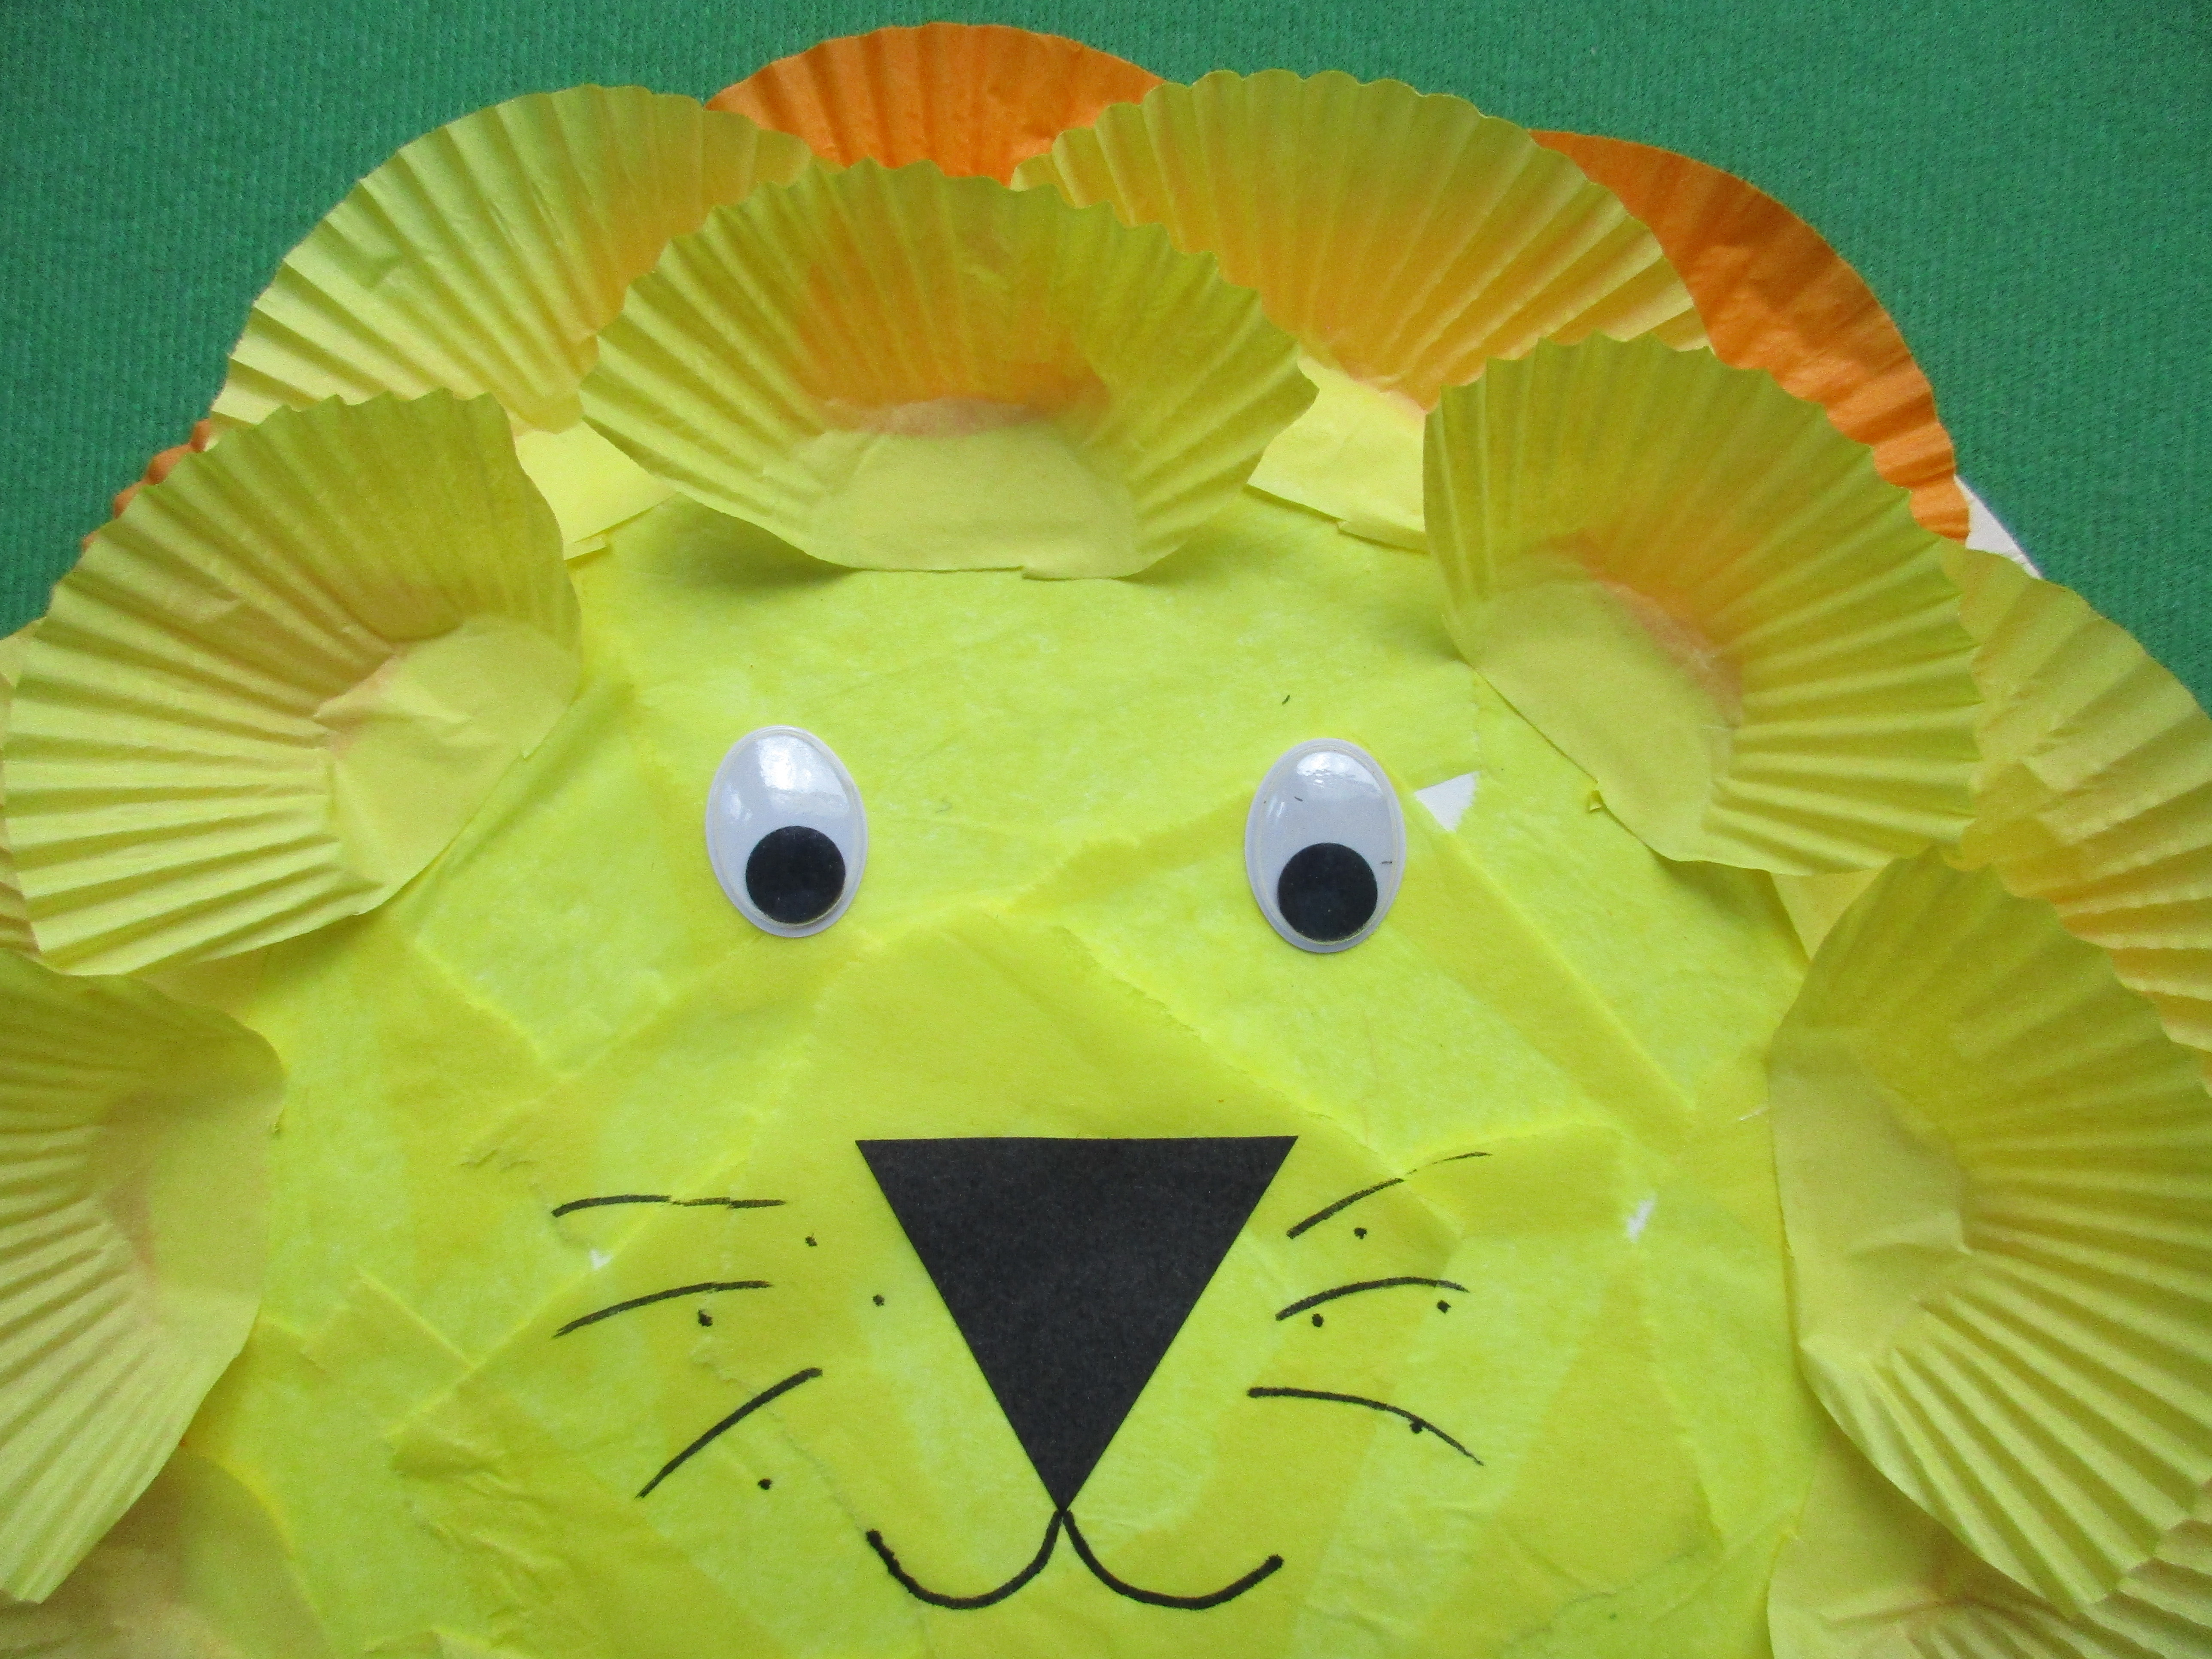 u2026u2026.black sugar paper black felt tip pen scissors glue and paper plate. & Paper plate lion   Let their light shine!